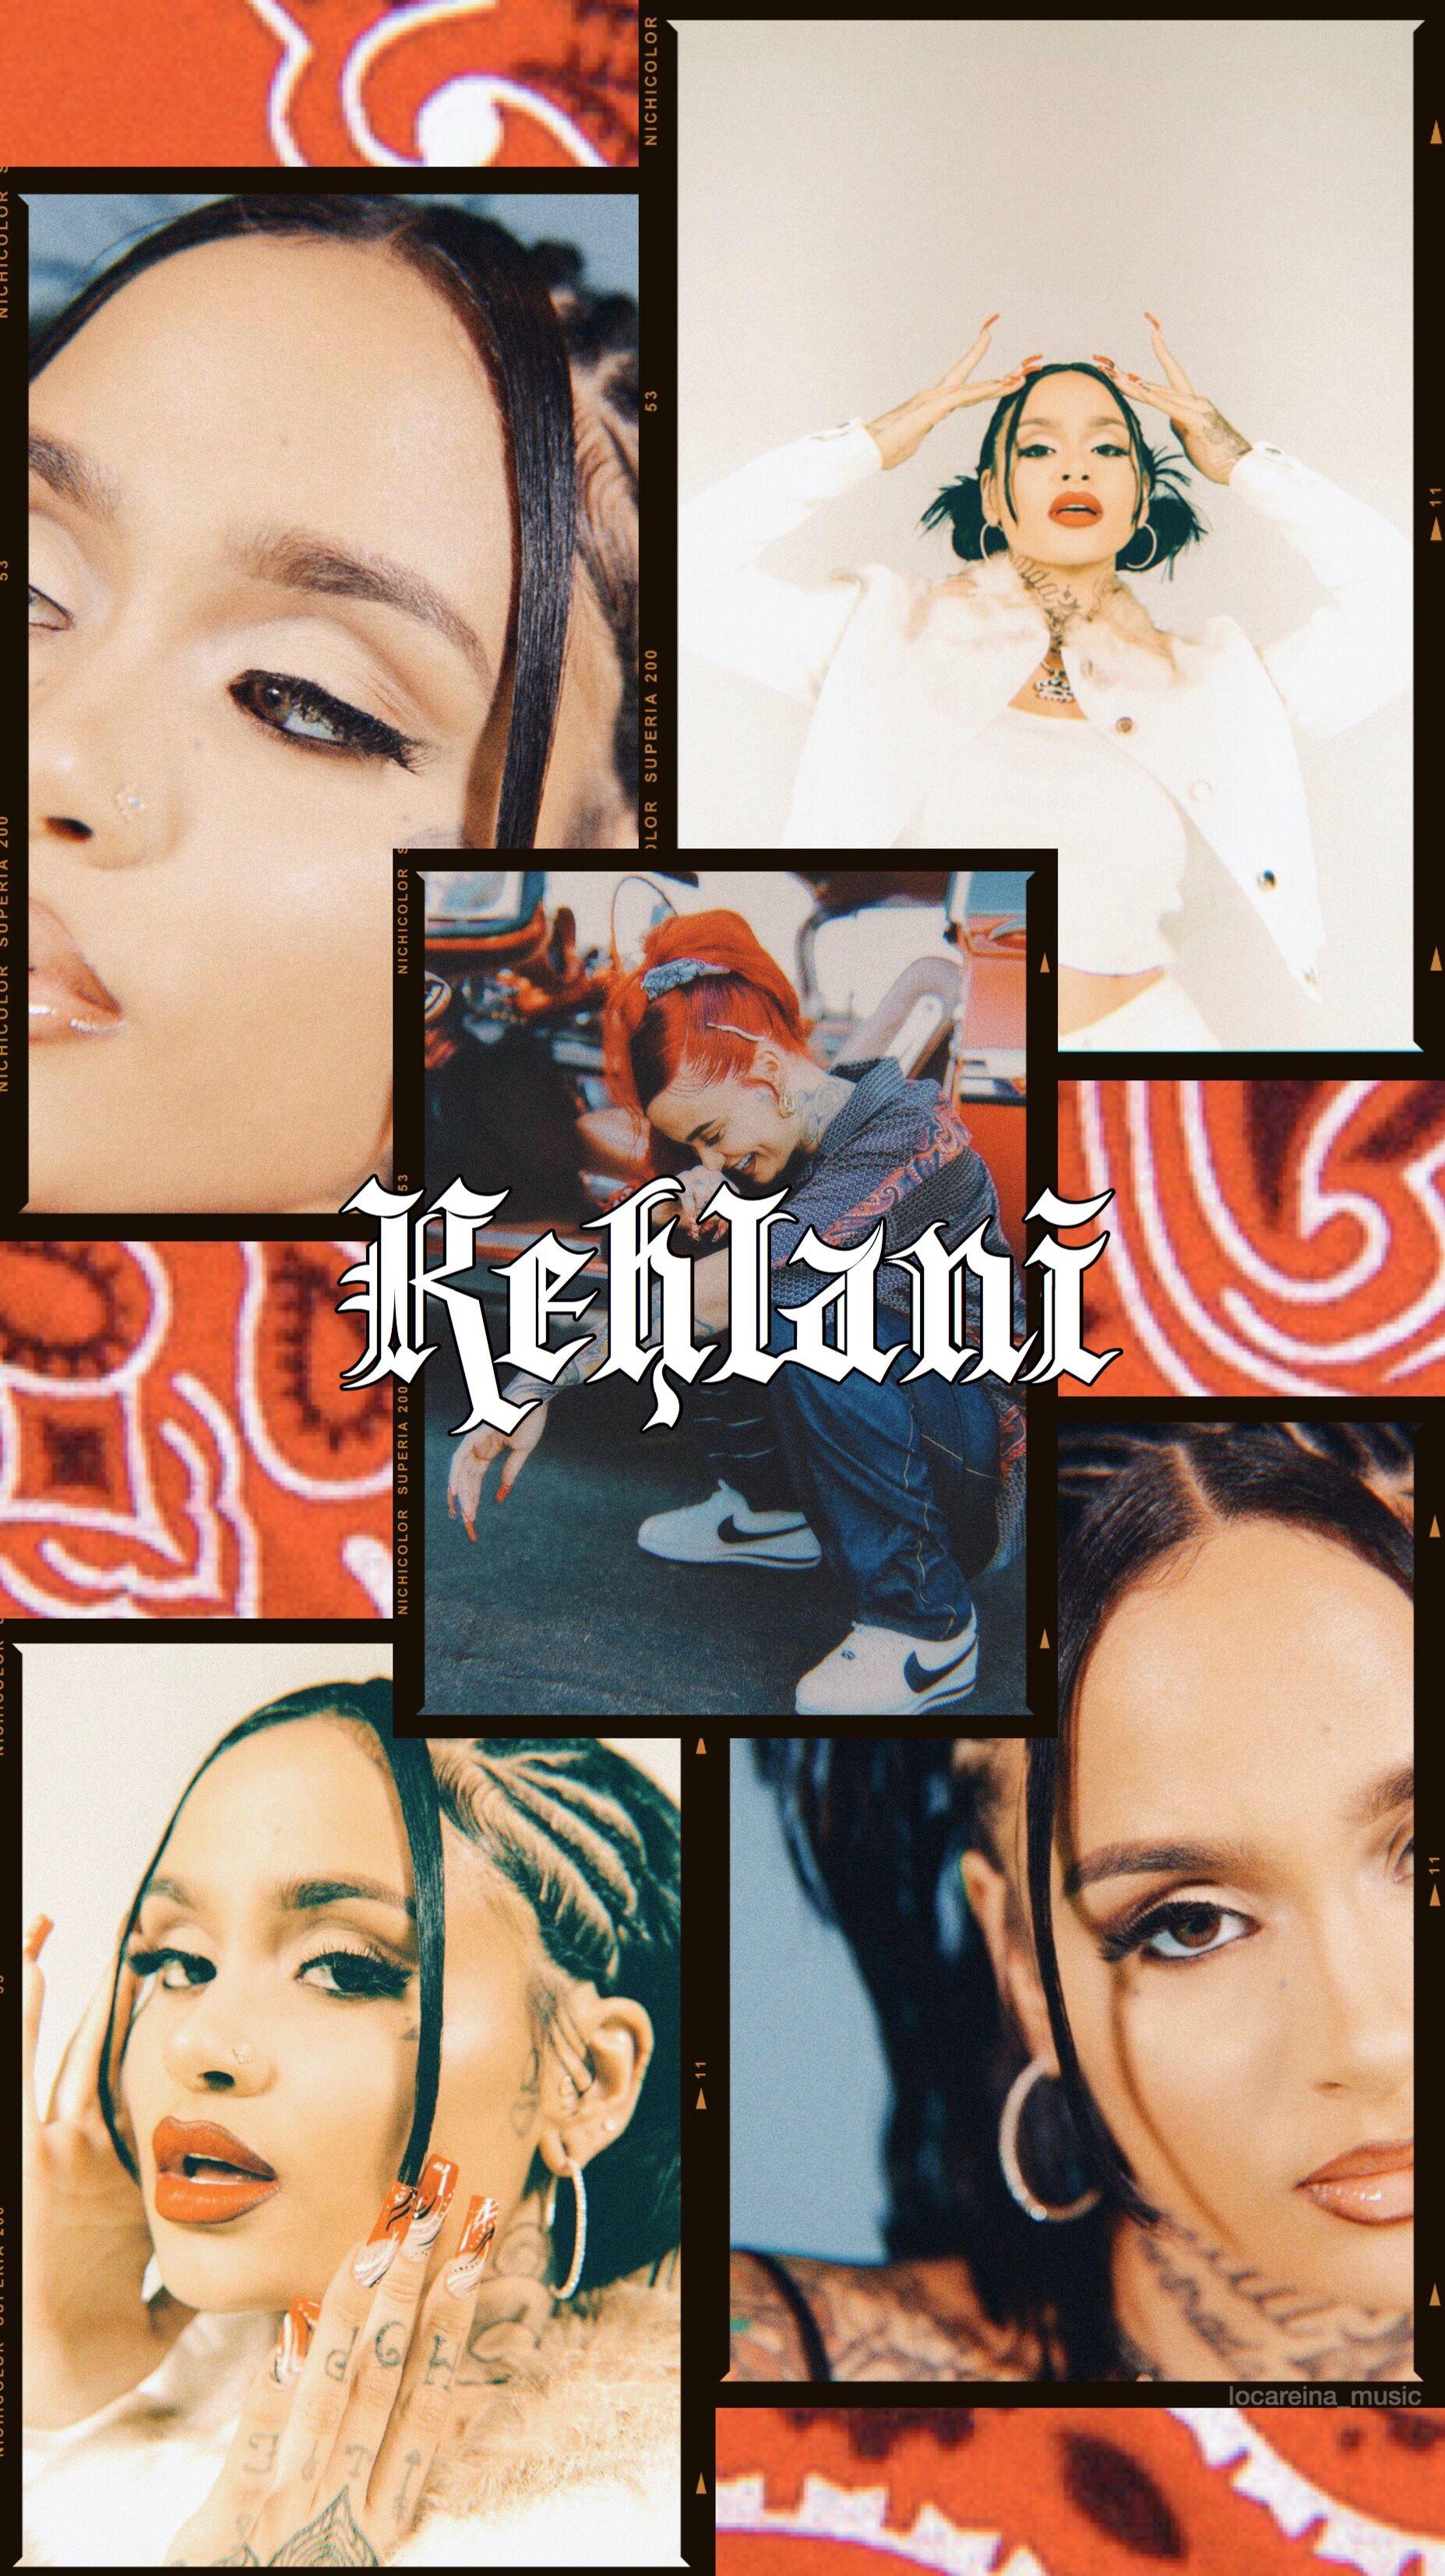 Kehlani Wallpaper Iphone Wallpaper Tumblr Aesthetic Bad Girl Wallpaper Edgy Wallpaper